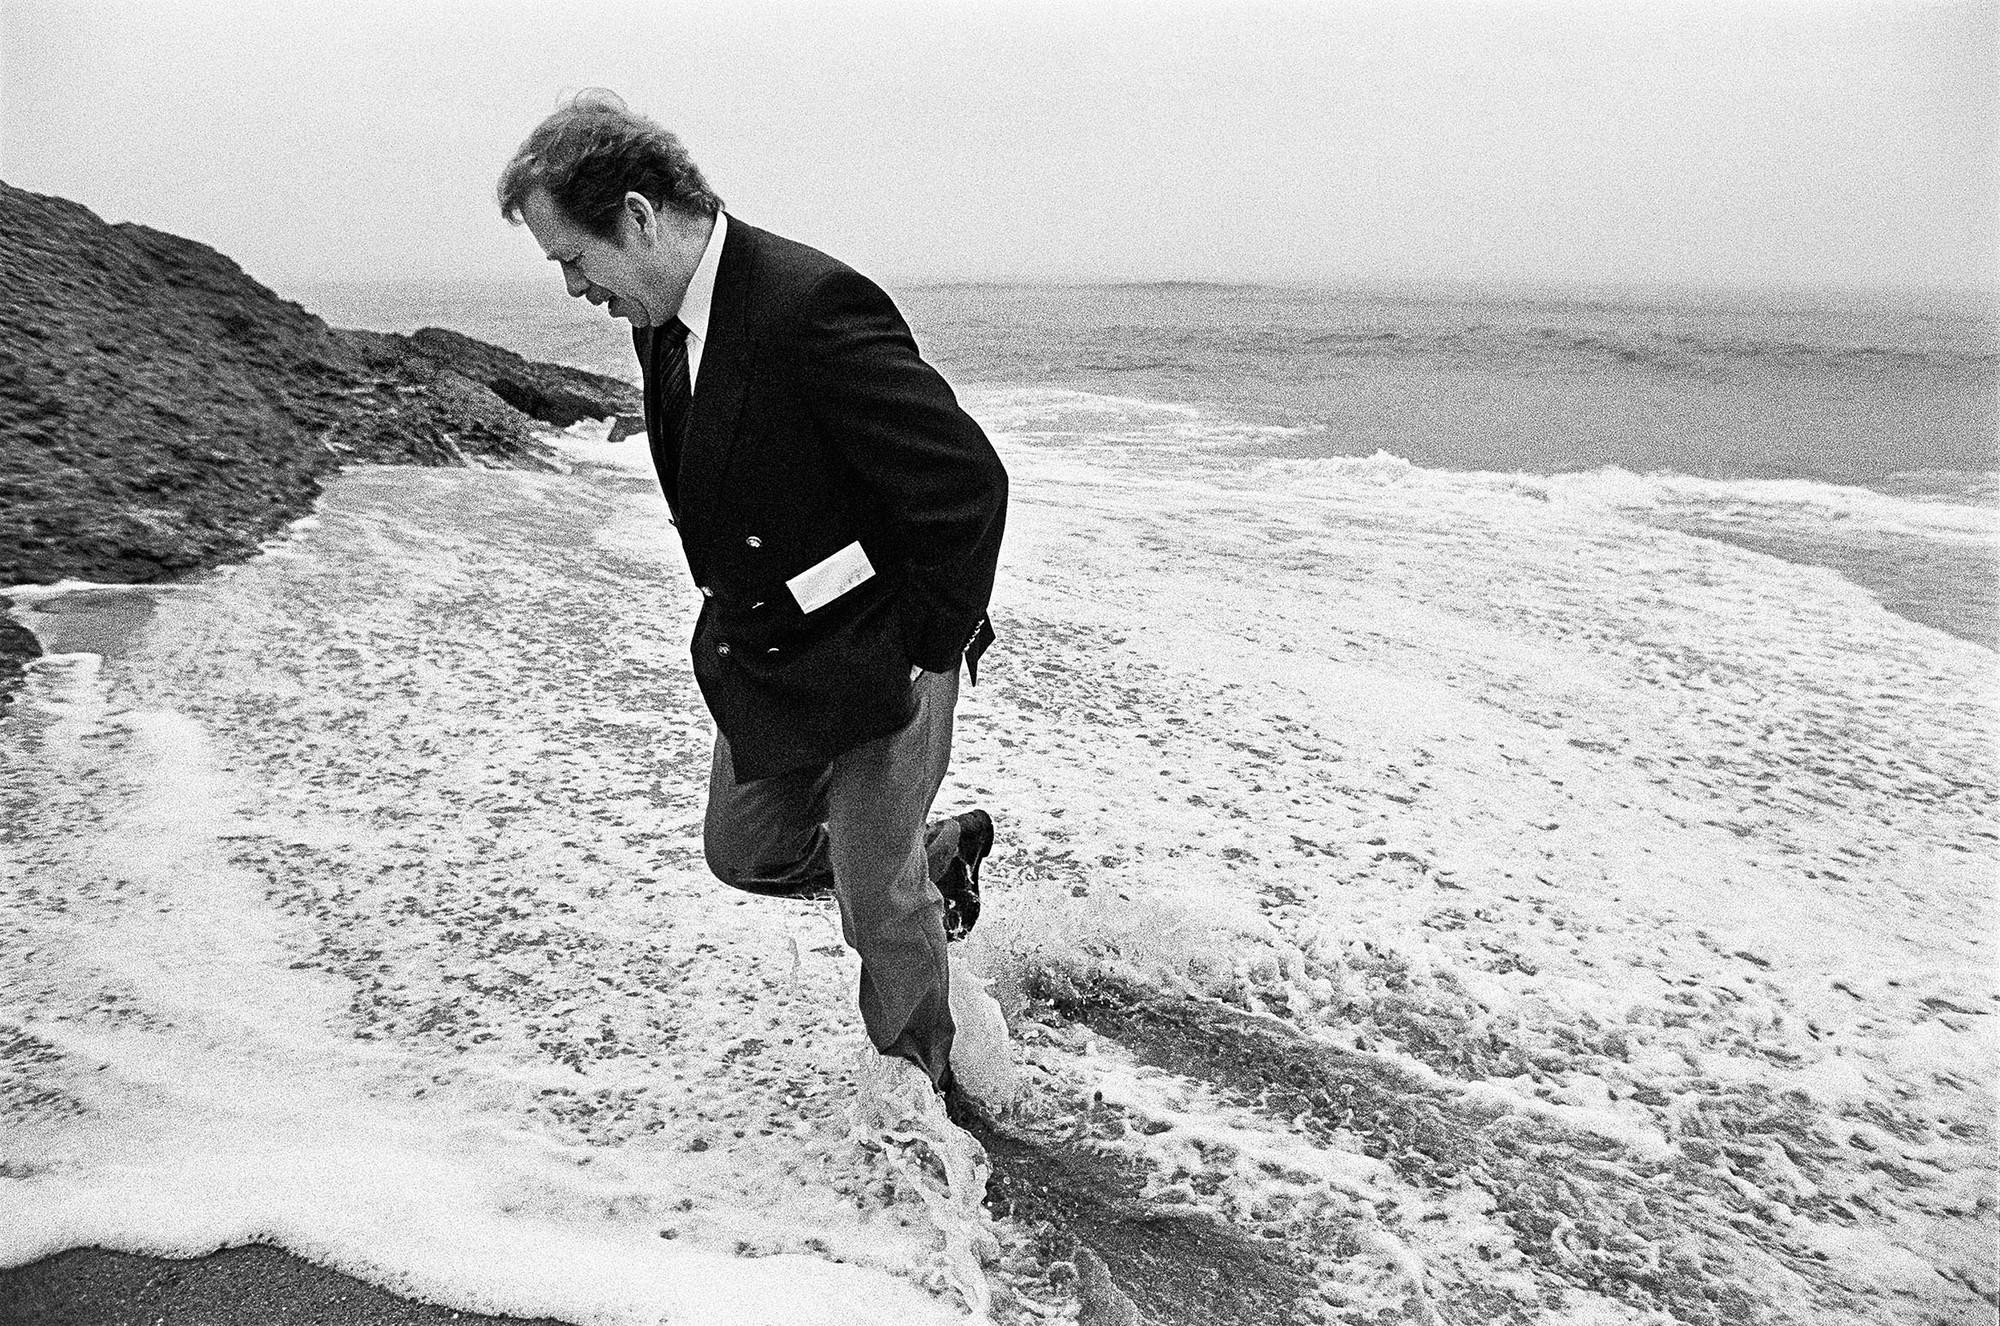 Vaclav Havel, 1990. Tomki Nemec